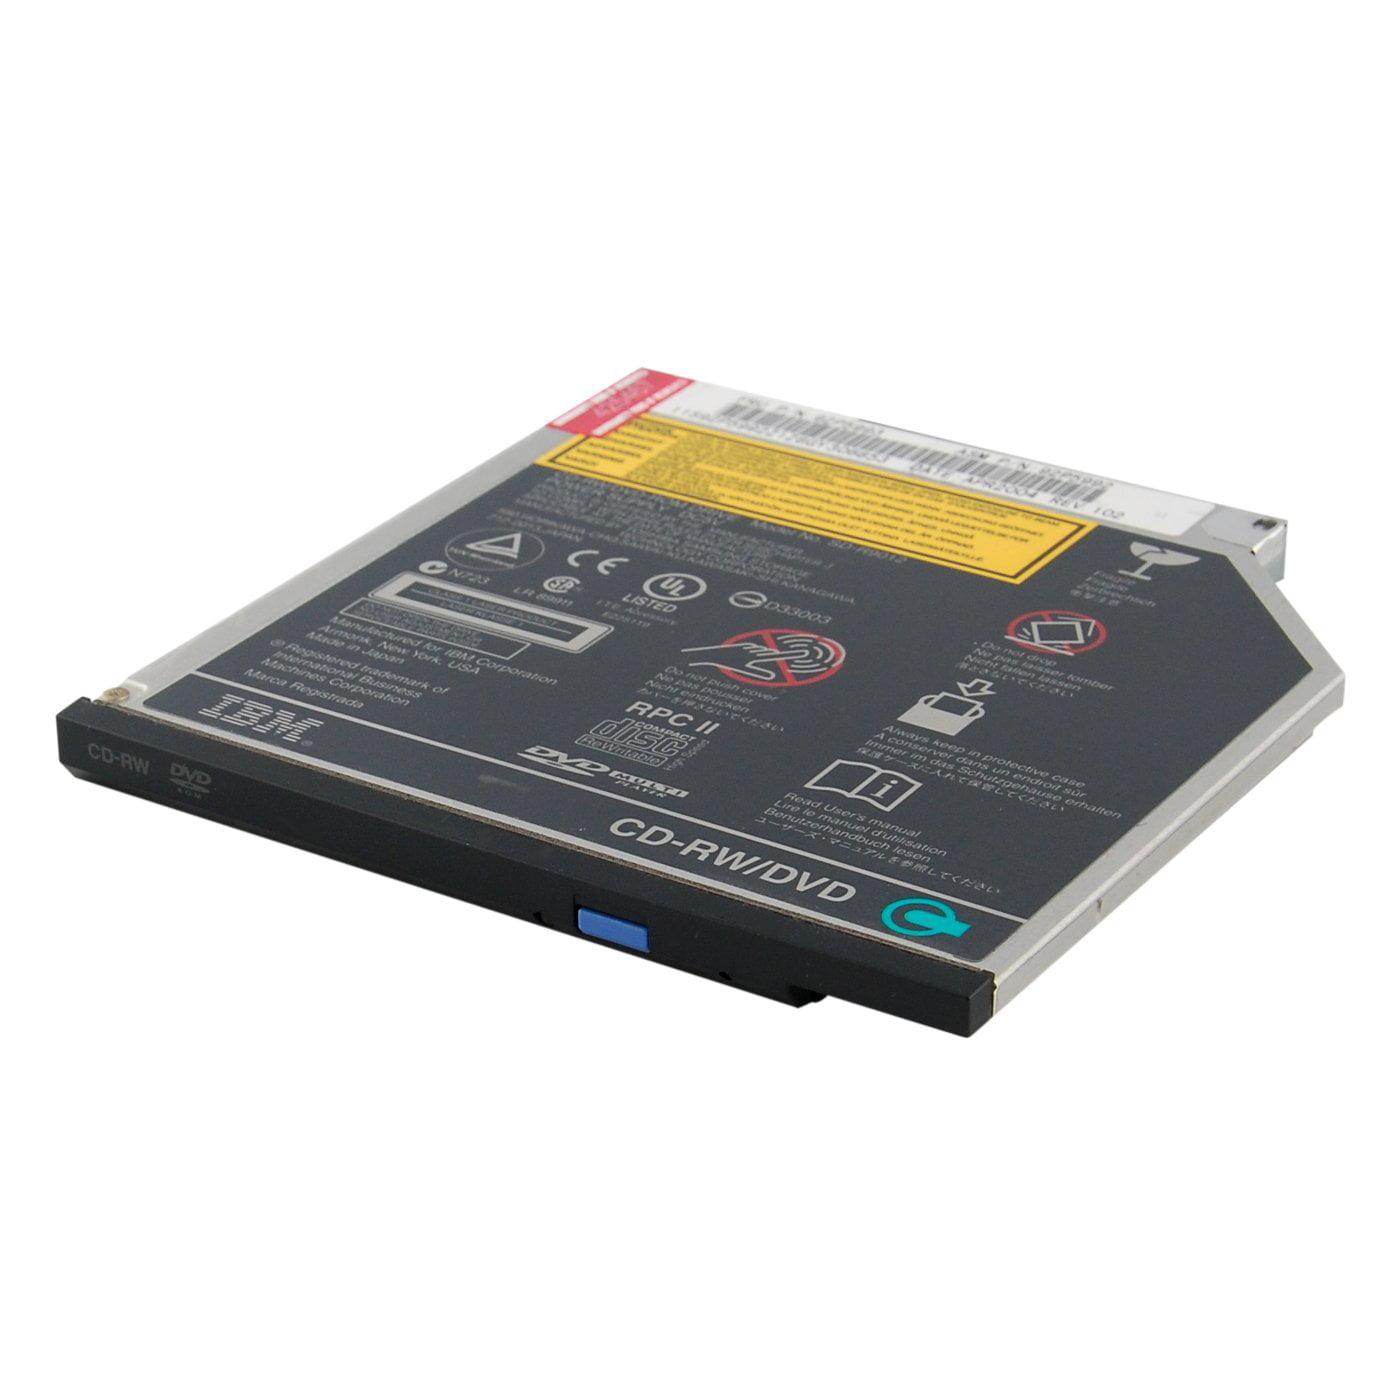 IBM Lenovo FRU P/N 92P5993 CD-RW DVD-ROM Optical Disk Drive